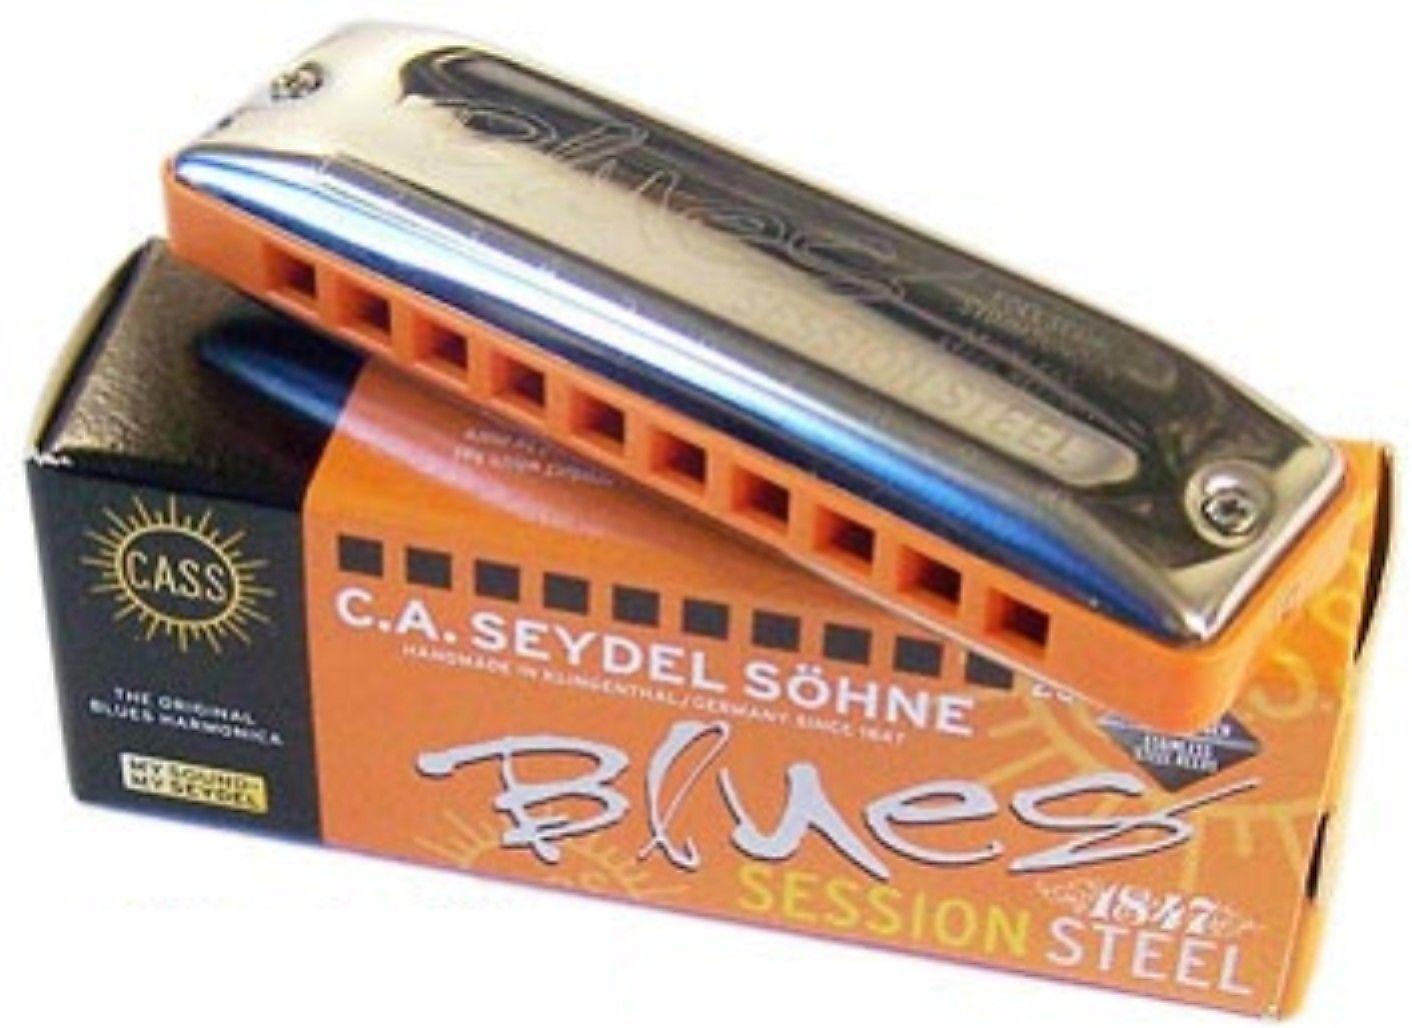 Seydel Session Steel Harmonica Low-C